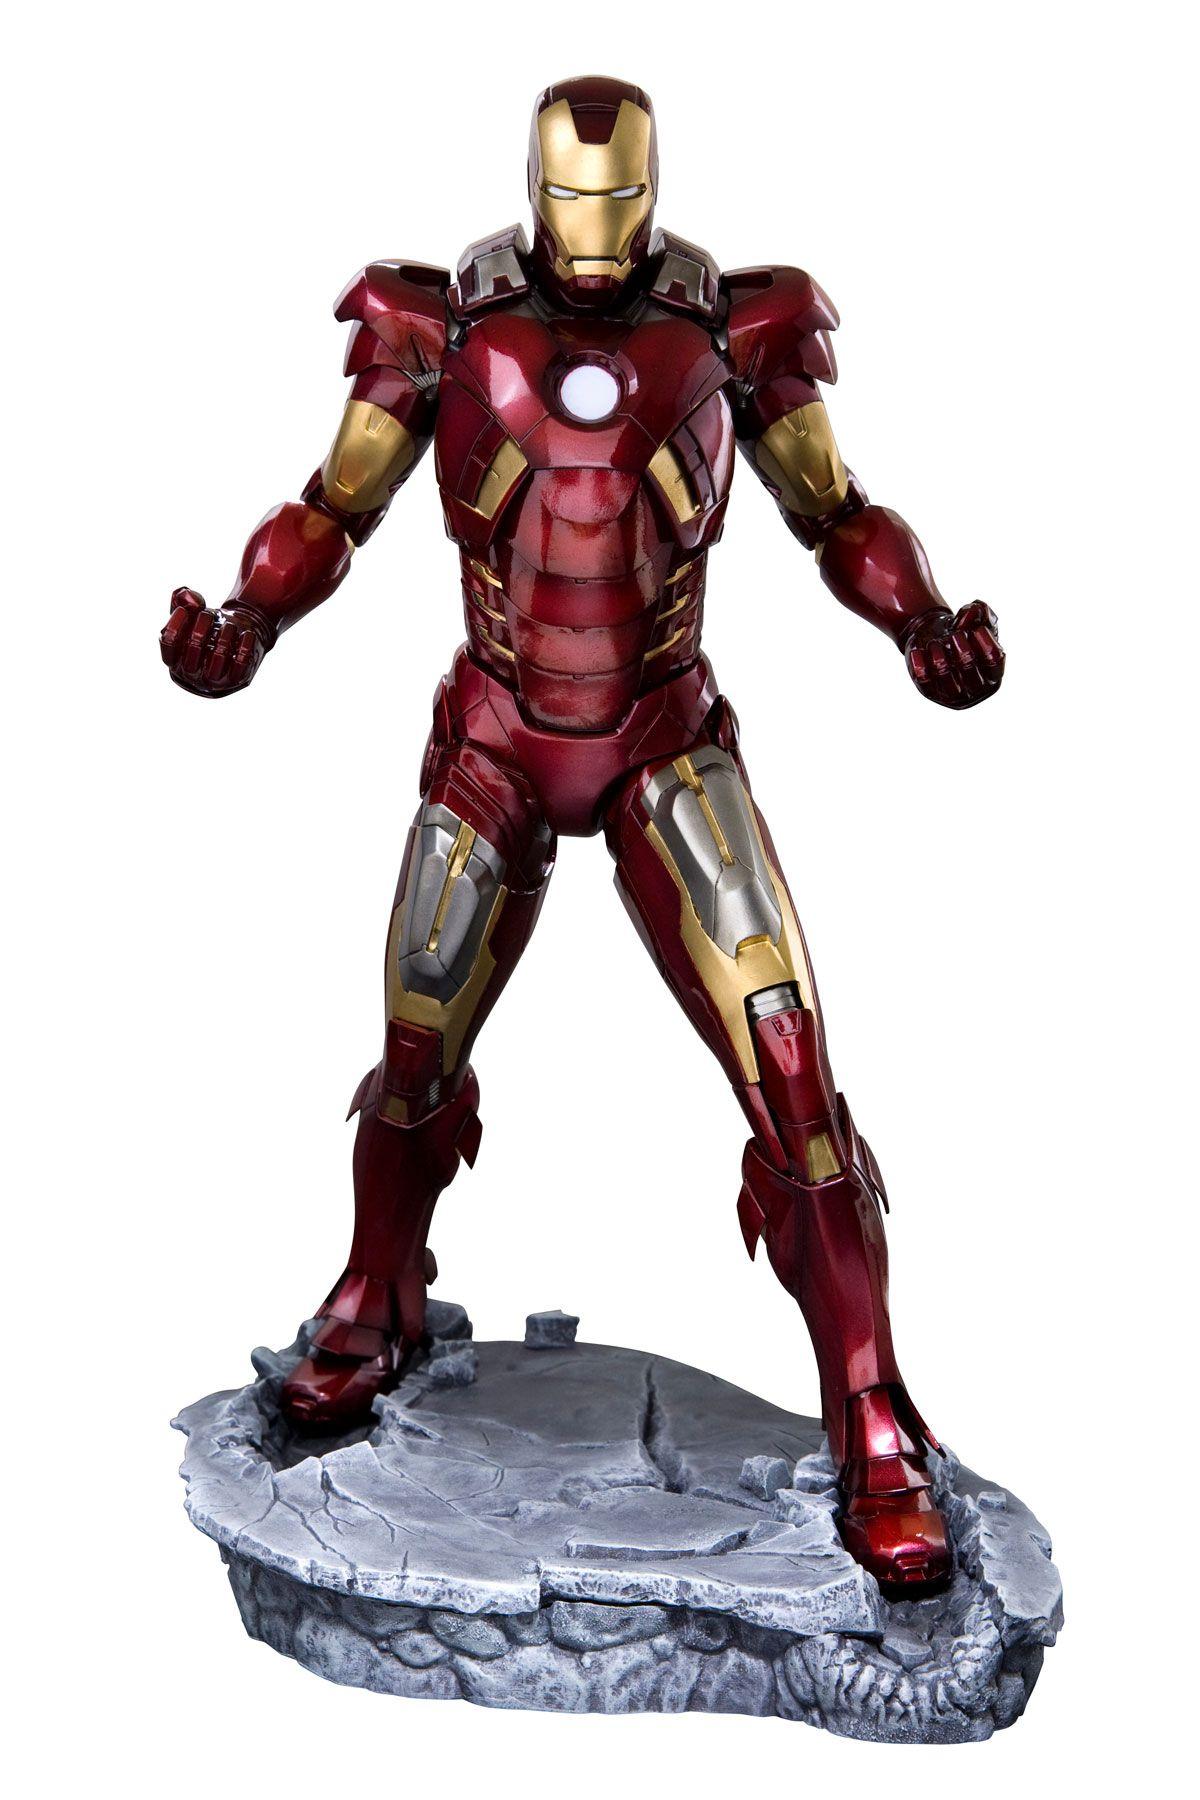 Figurine Iron Man Mark III Stealth Mode Ver. 2015 Summer Exclusive 30cm